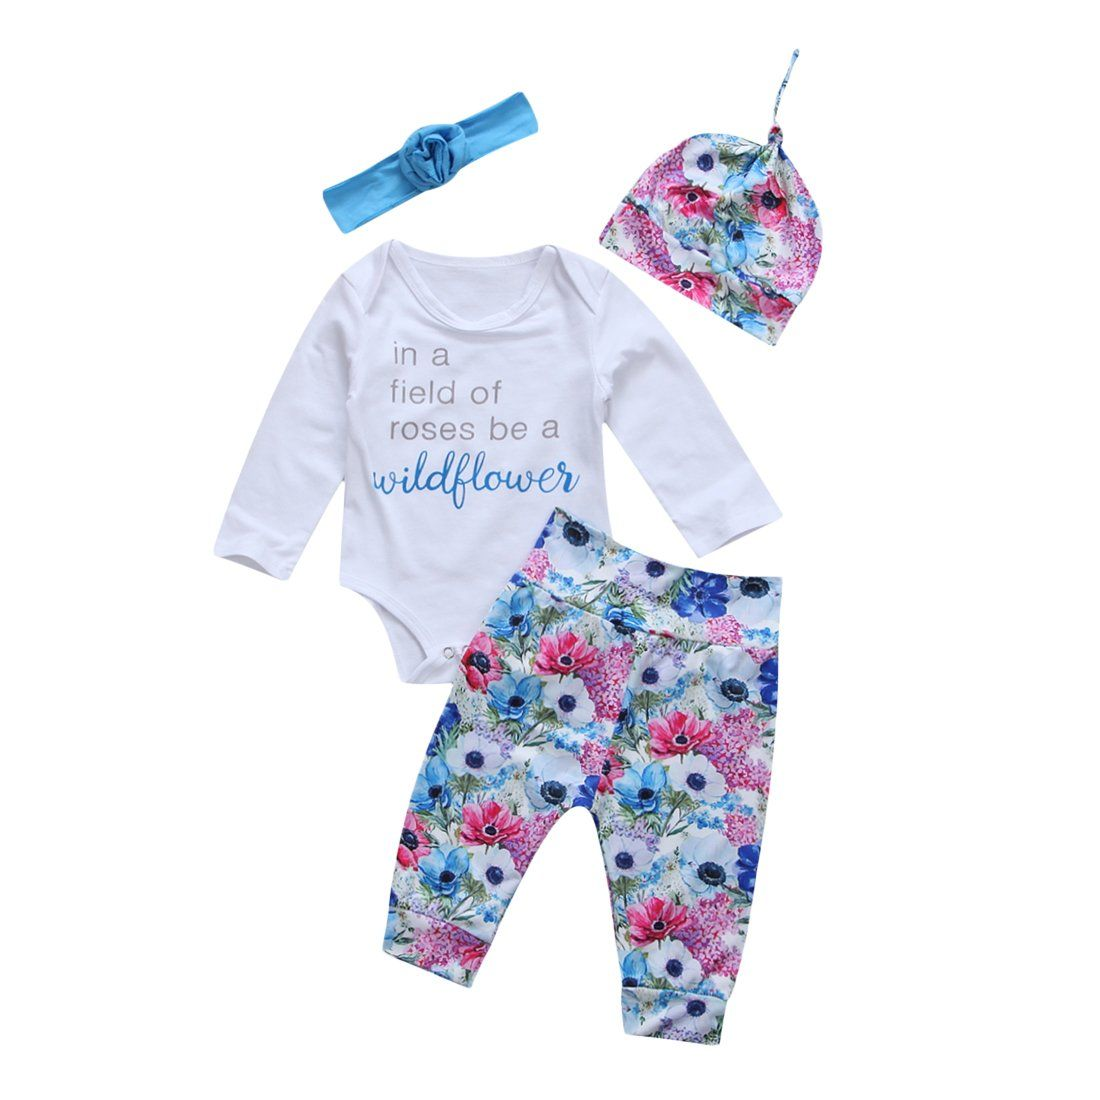 4PCS Newborn Baby Girl Kid Tops Romper Floral Pants Headband Outfits Set Clothes